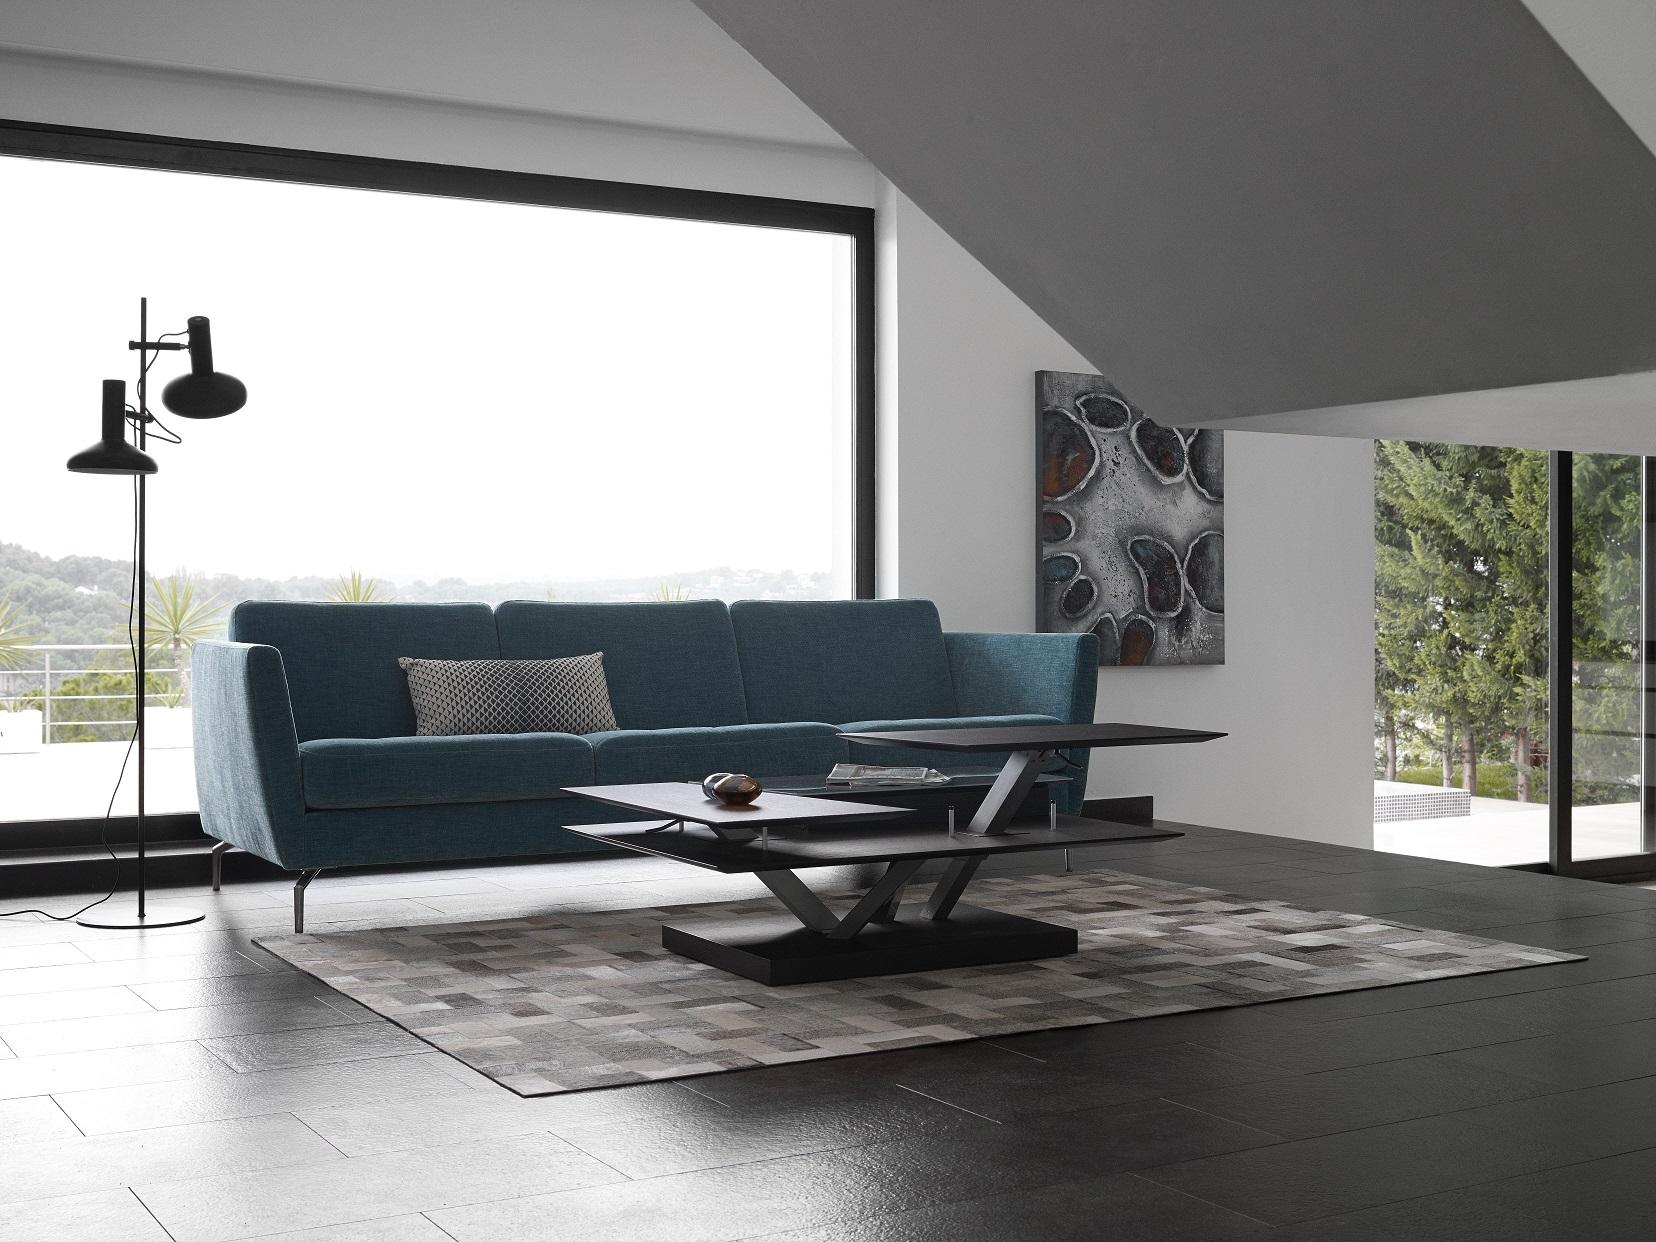 Mads mikkelsen aime les meubles design danois mon coin design for Buro concept